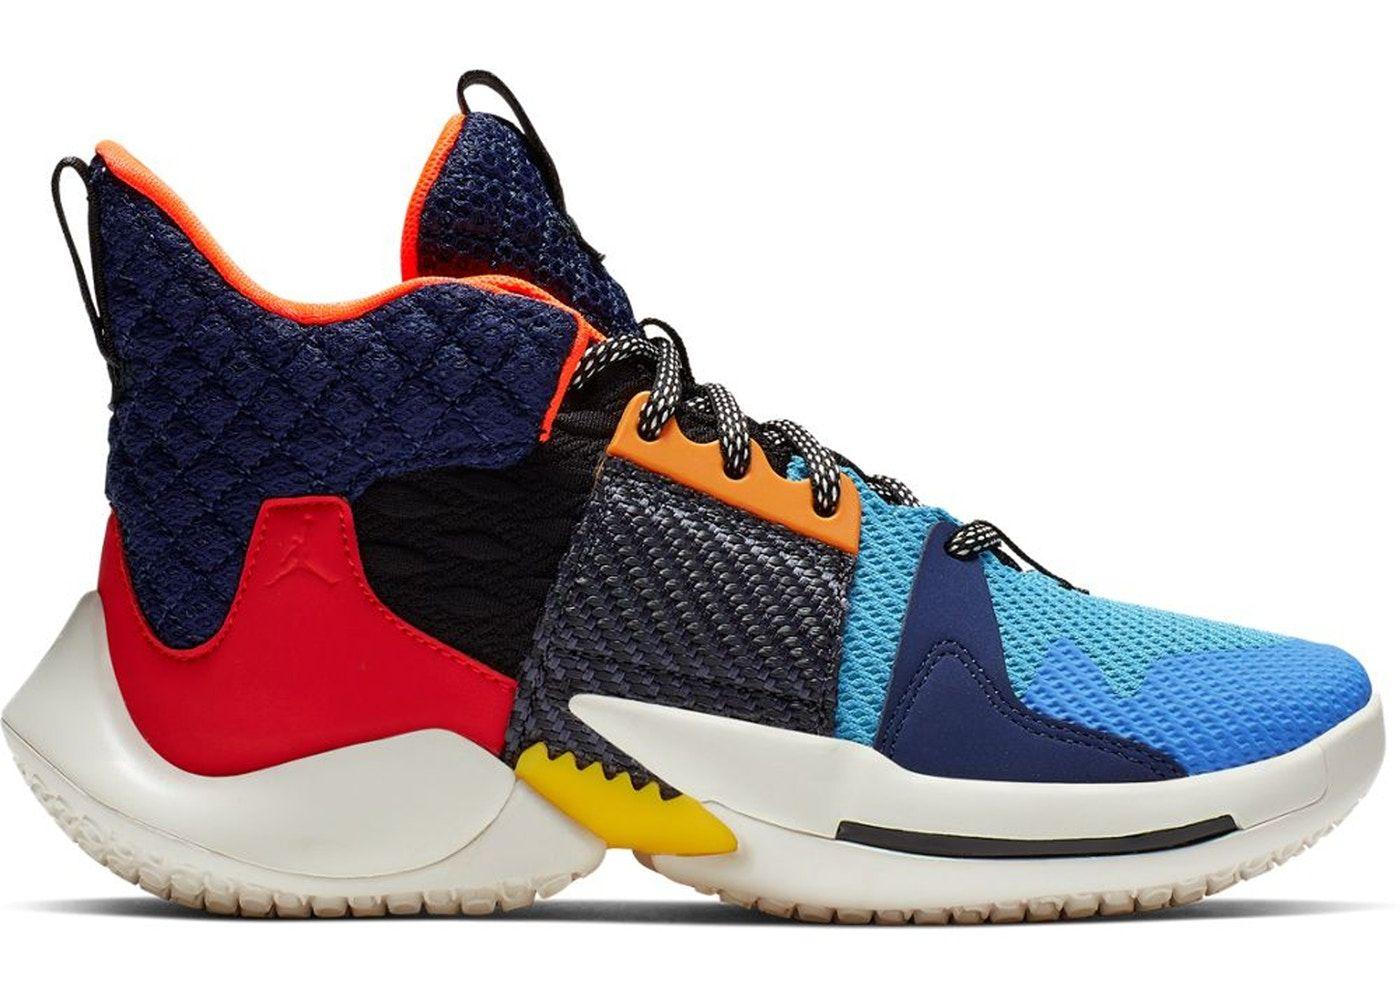 Jordans, Sneakers, Basketball shoes